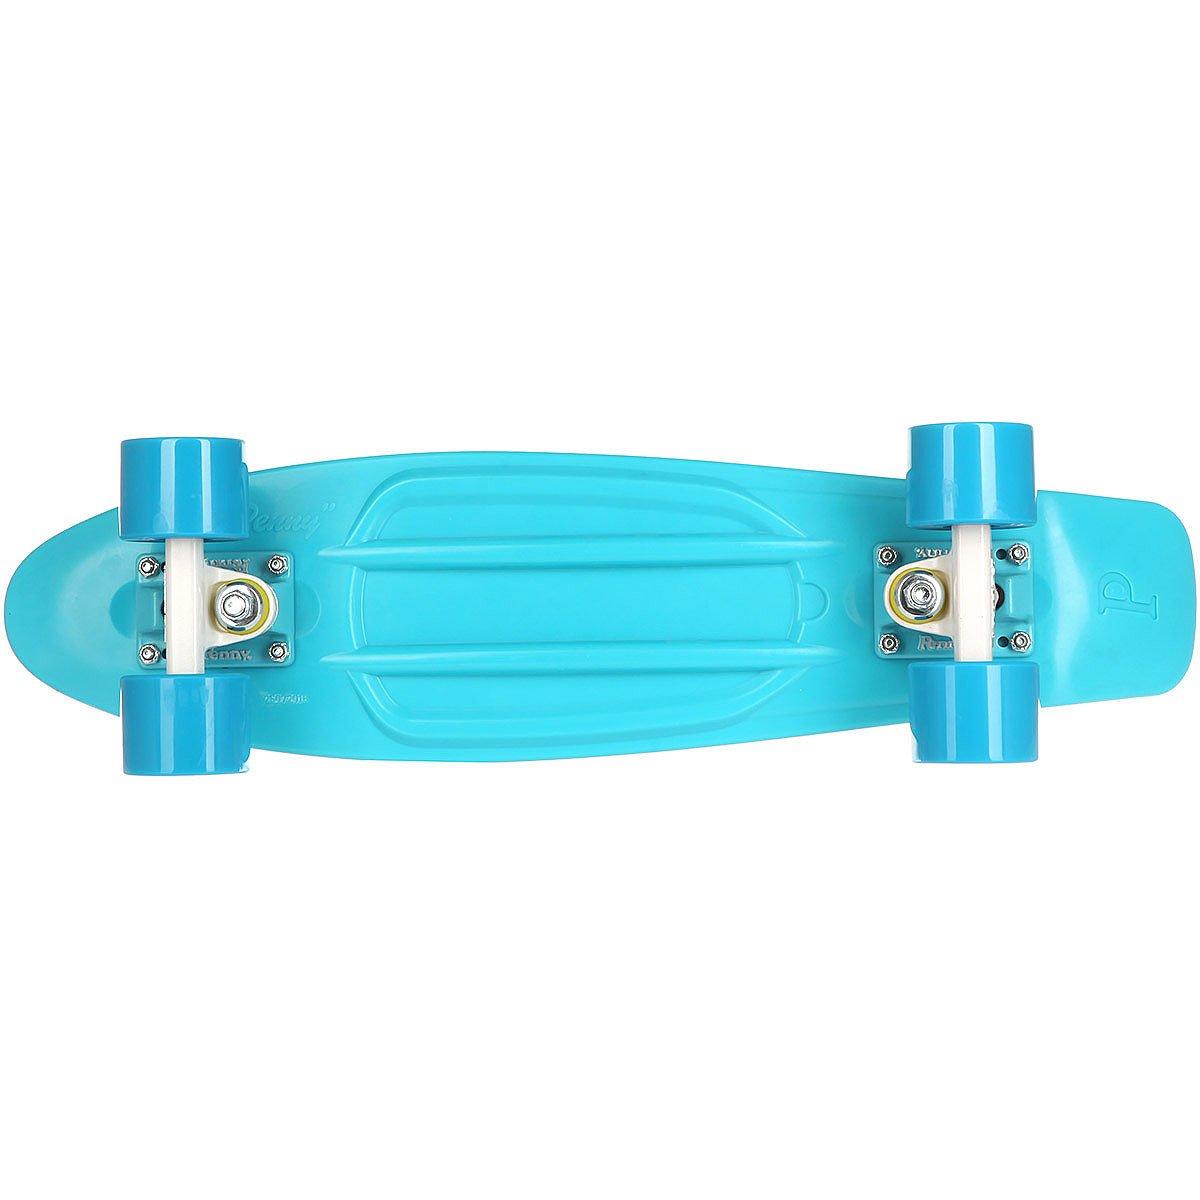 Скейт мини круизер Penny Original 22 Lagoon 5.75 x 22 (55.9 см)